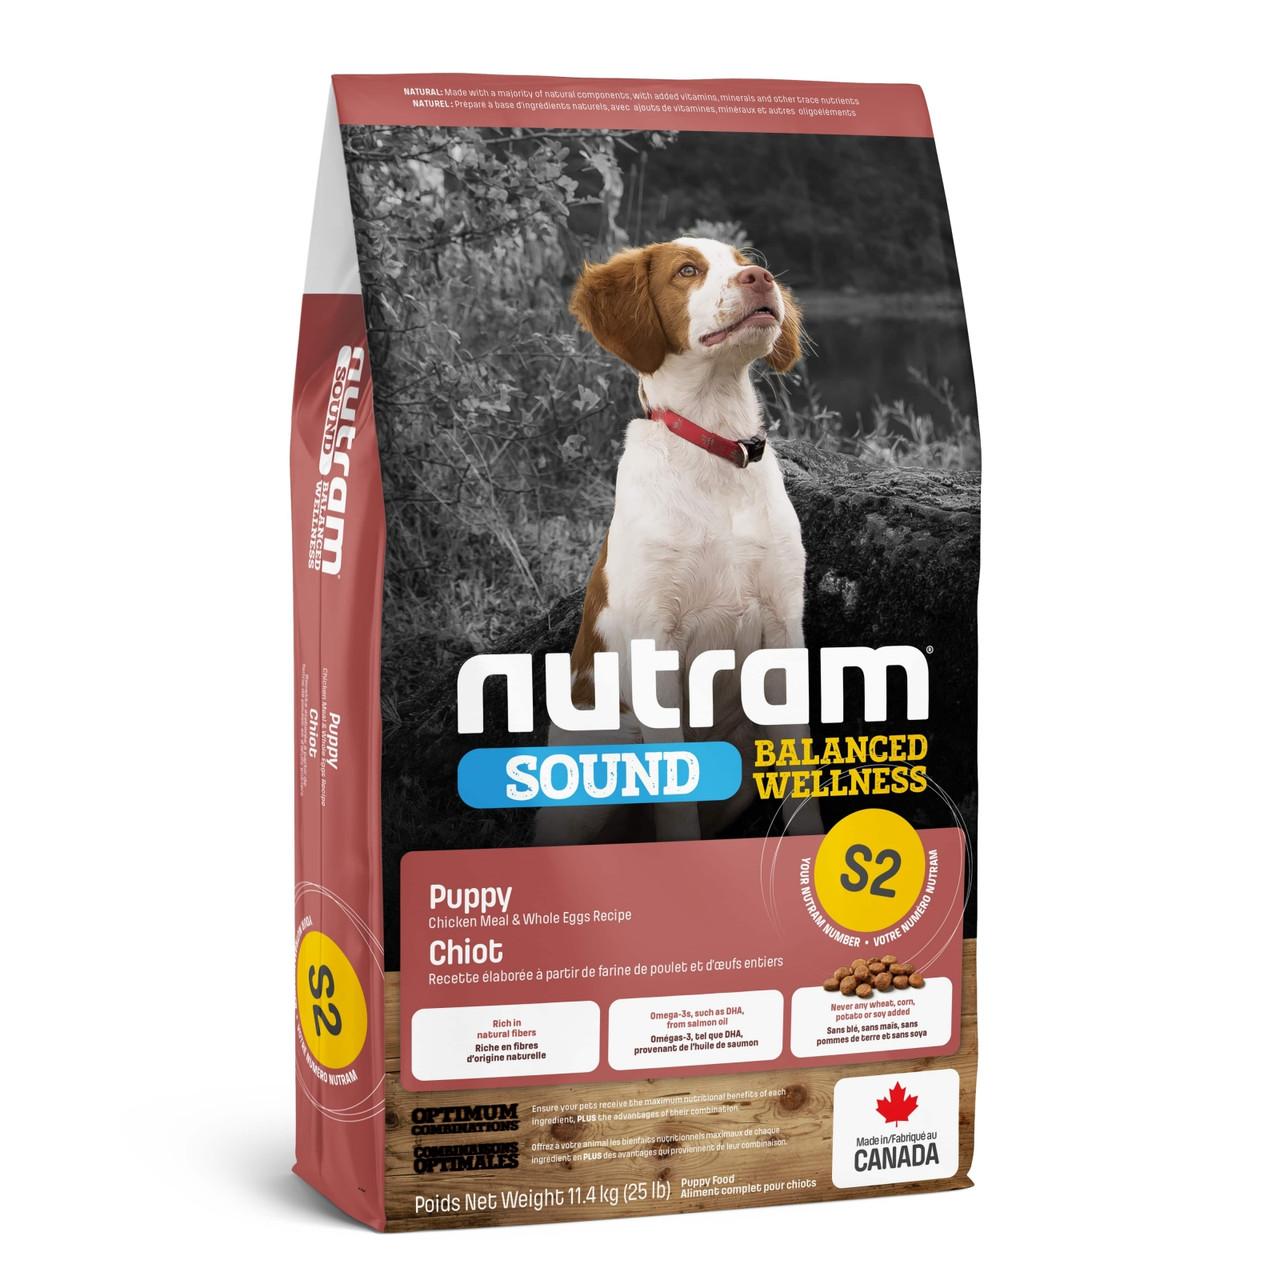 Nutram (Нутрам) S2 Sound Balanced Wellness Natural Puppy Food сухой корм для щенков, 20 кг